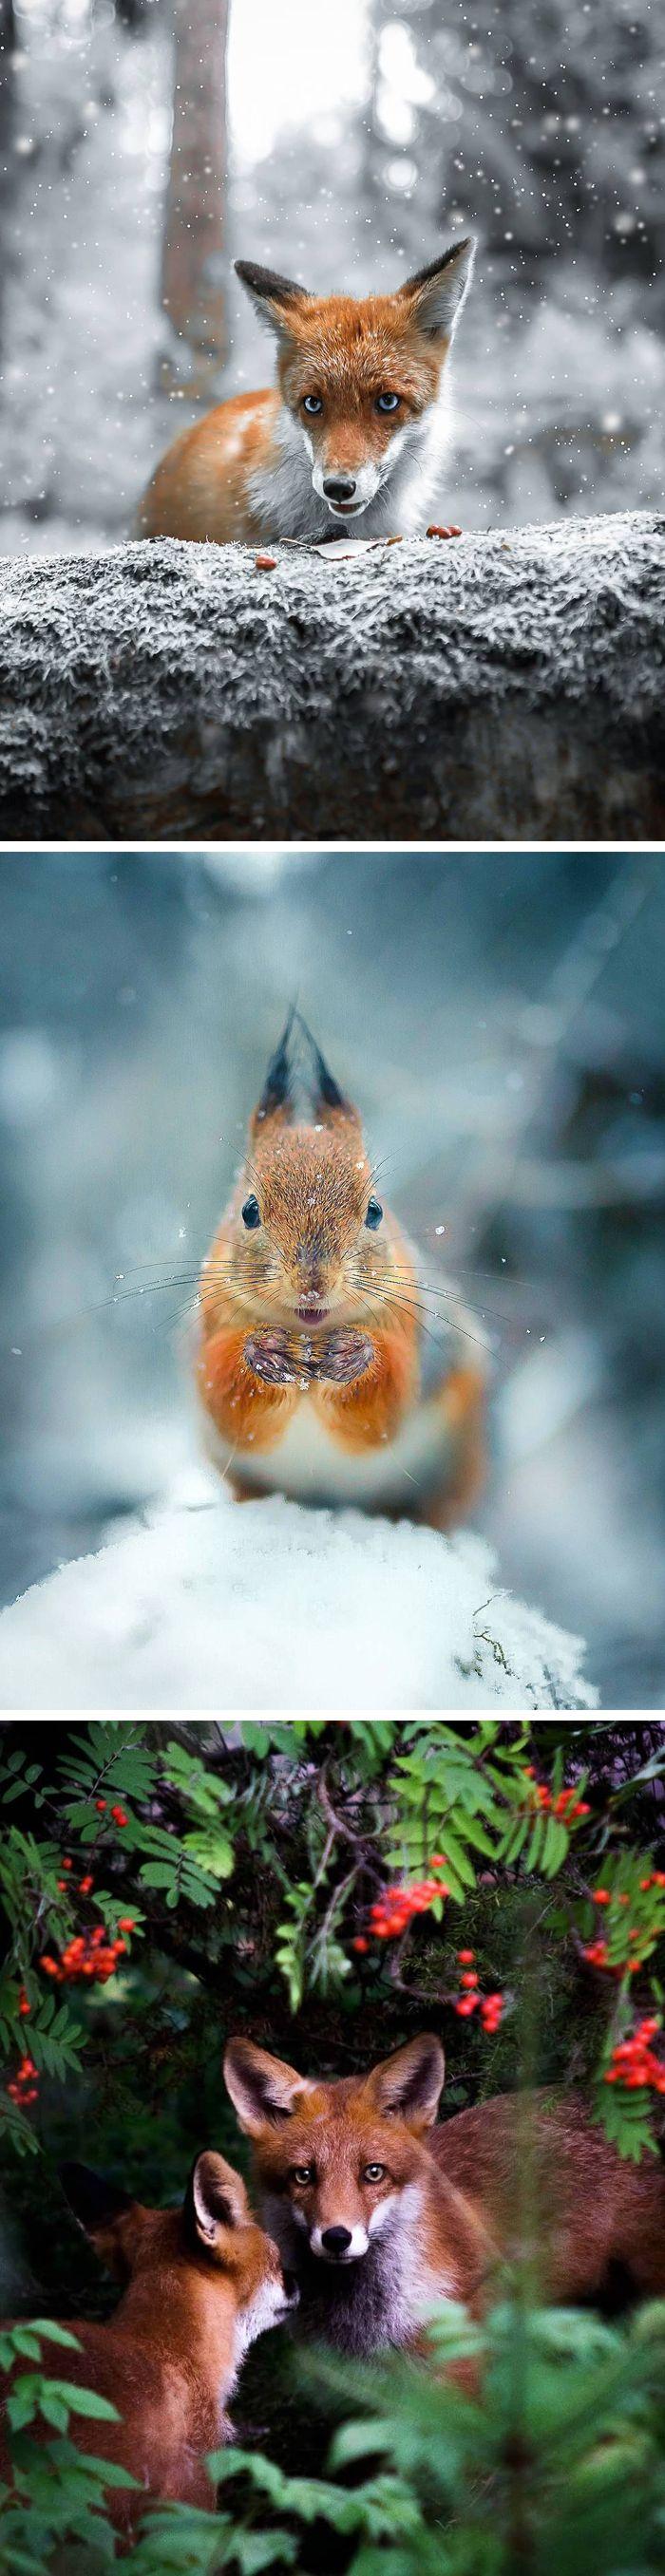 Joachim Munter captures intimate photos of Finland's fairytale forest animals in the wild. #photography #animalphotography #winterwonderland